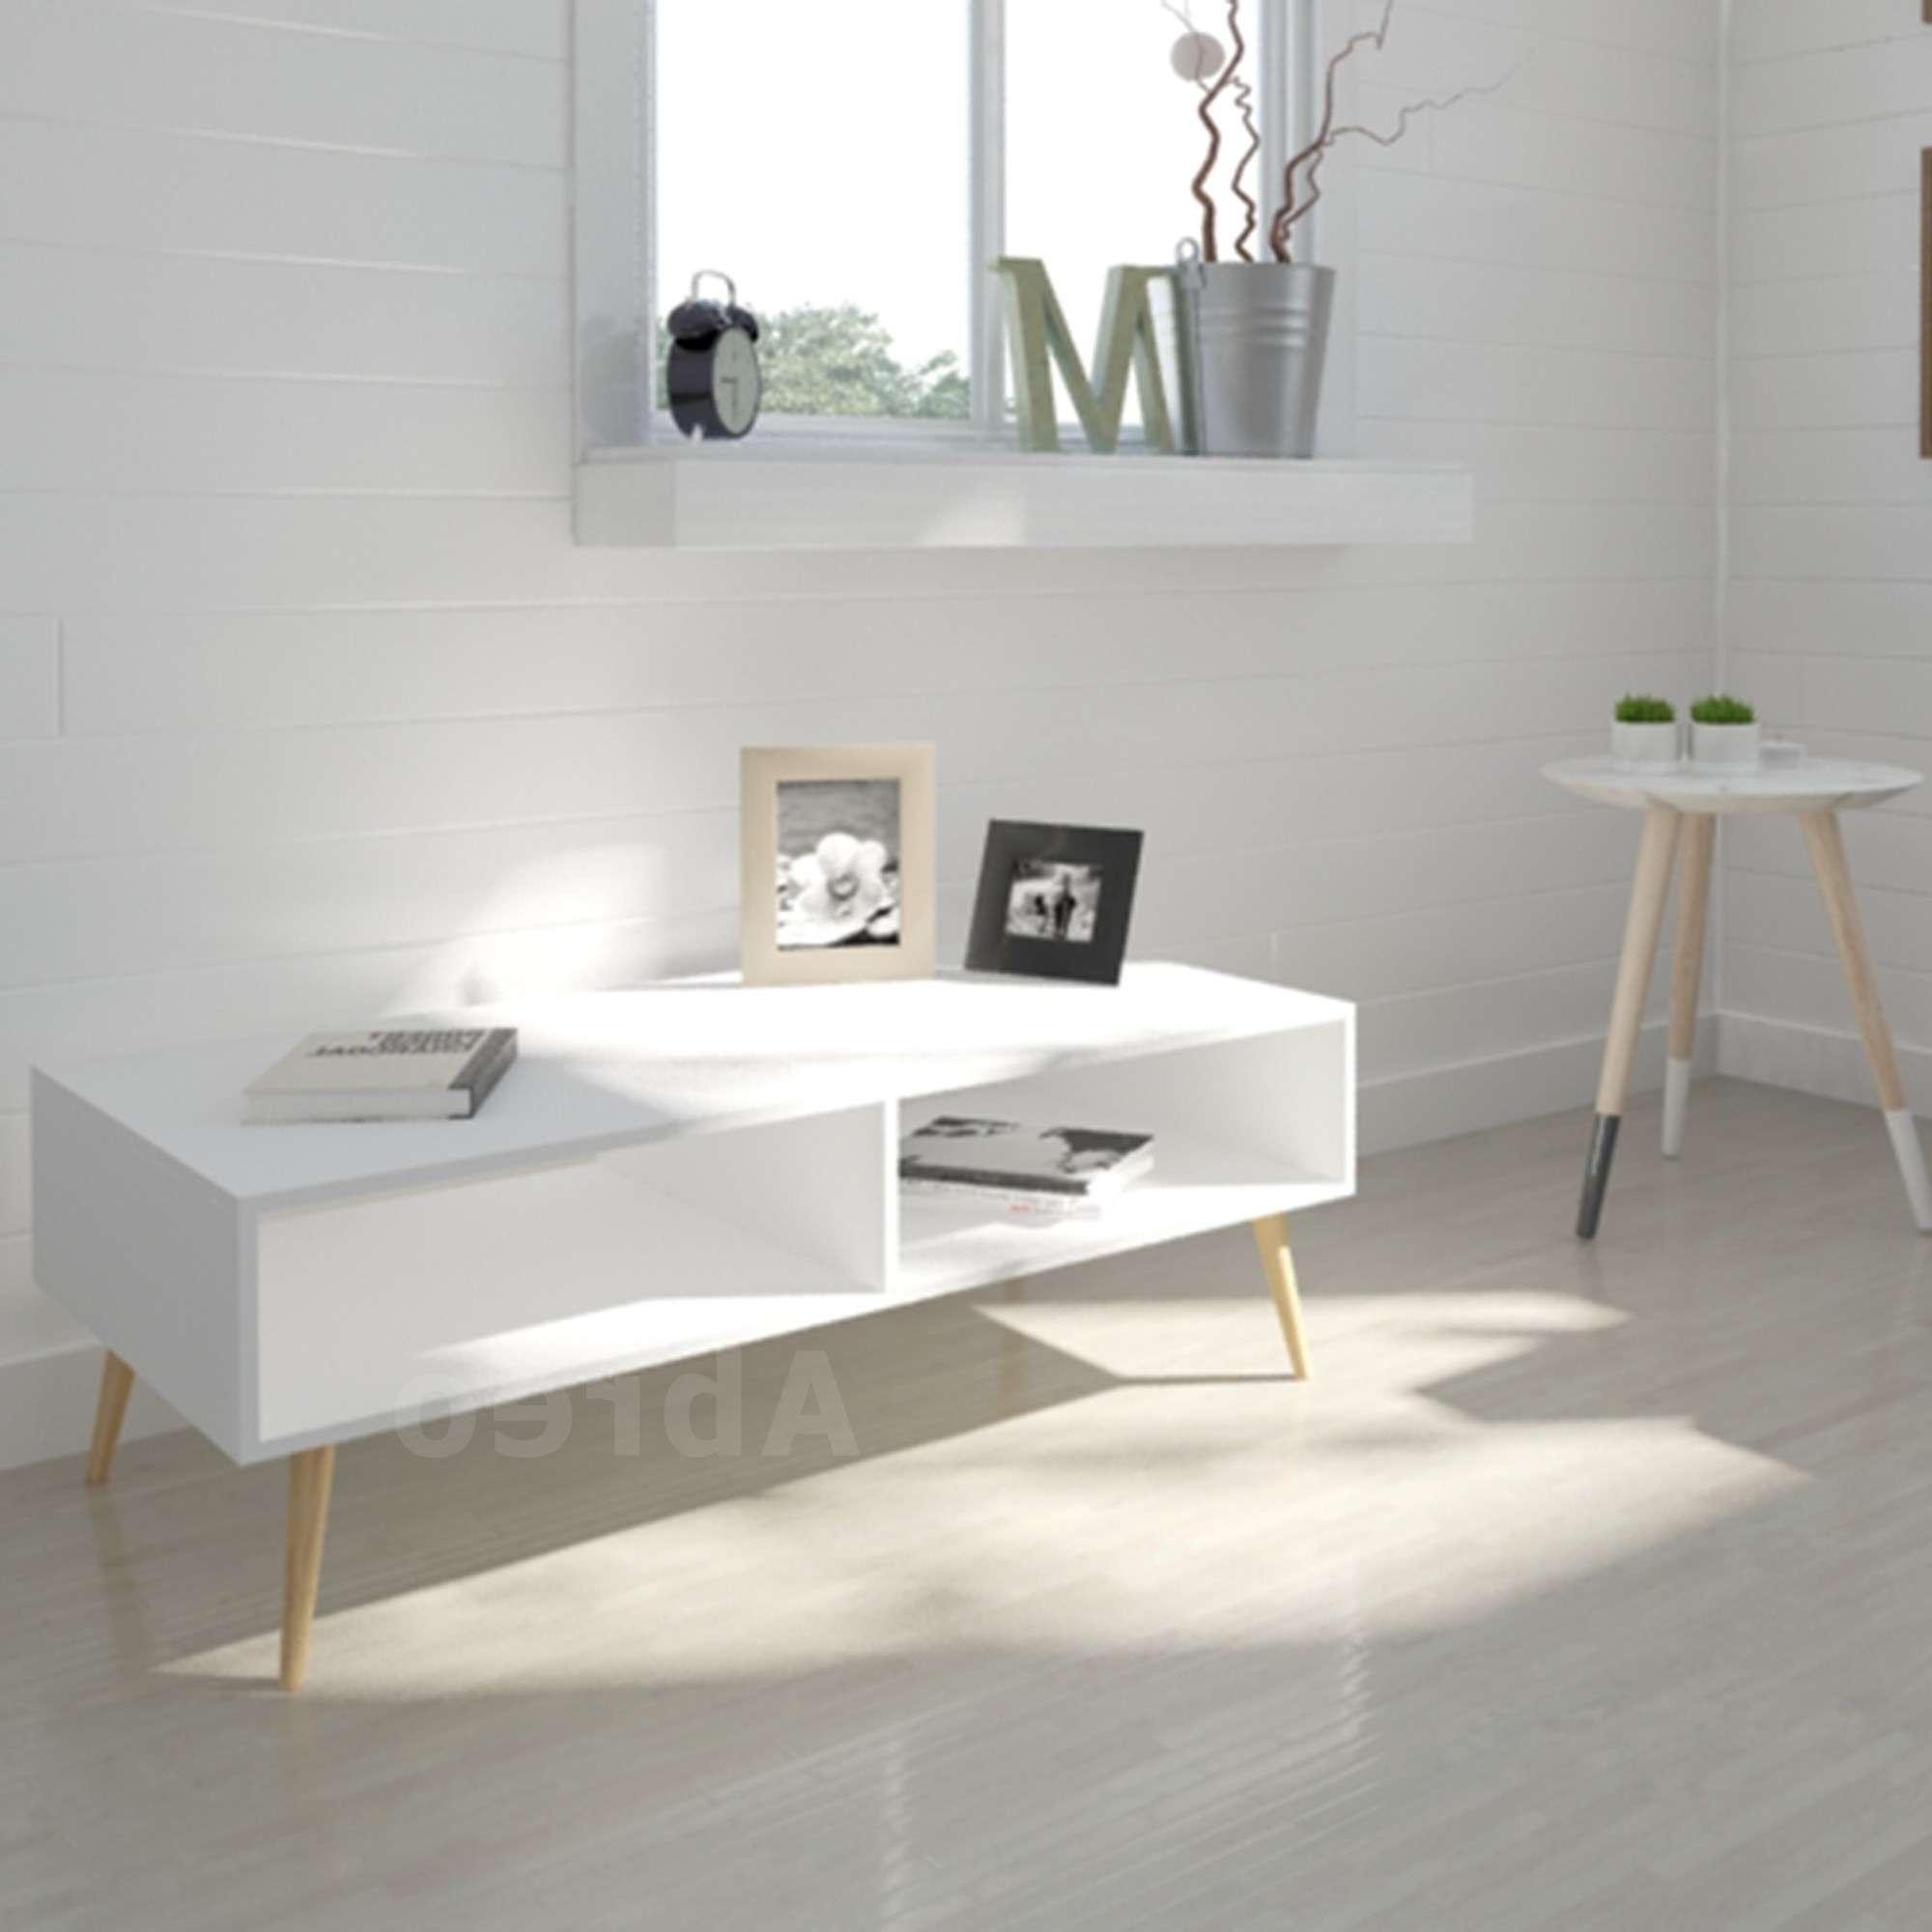 Scandinavian Modern Tv Stand From Abreo Abreo Home Furniture Inside Scandinavian Design Tv Cabinets (View 3 of 20)